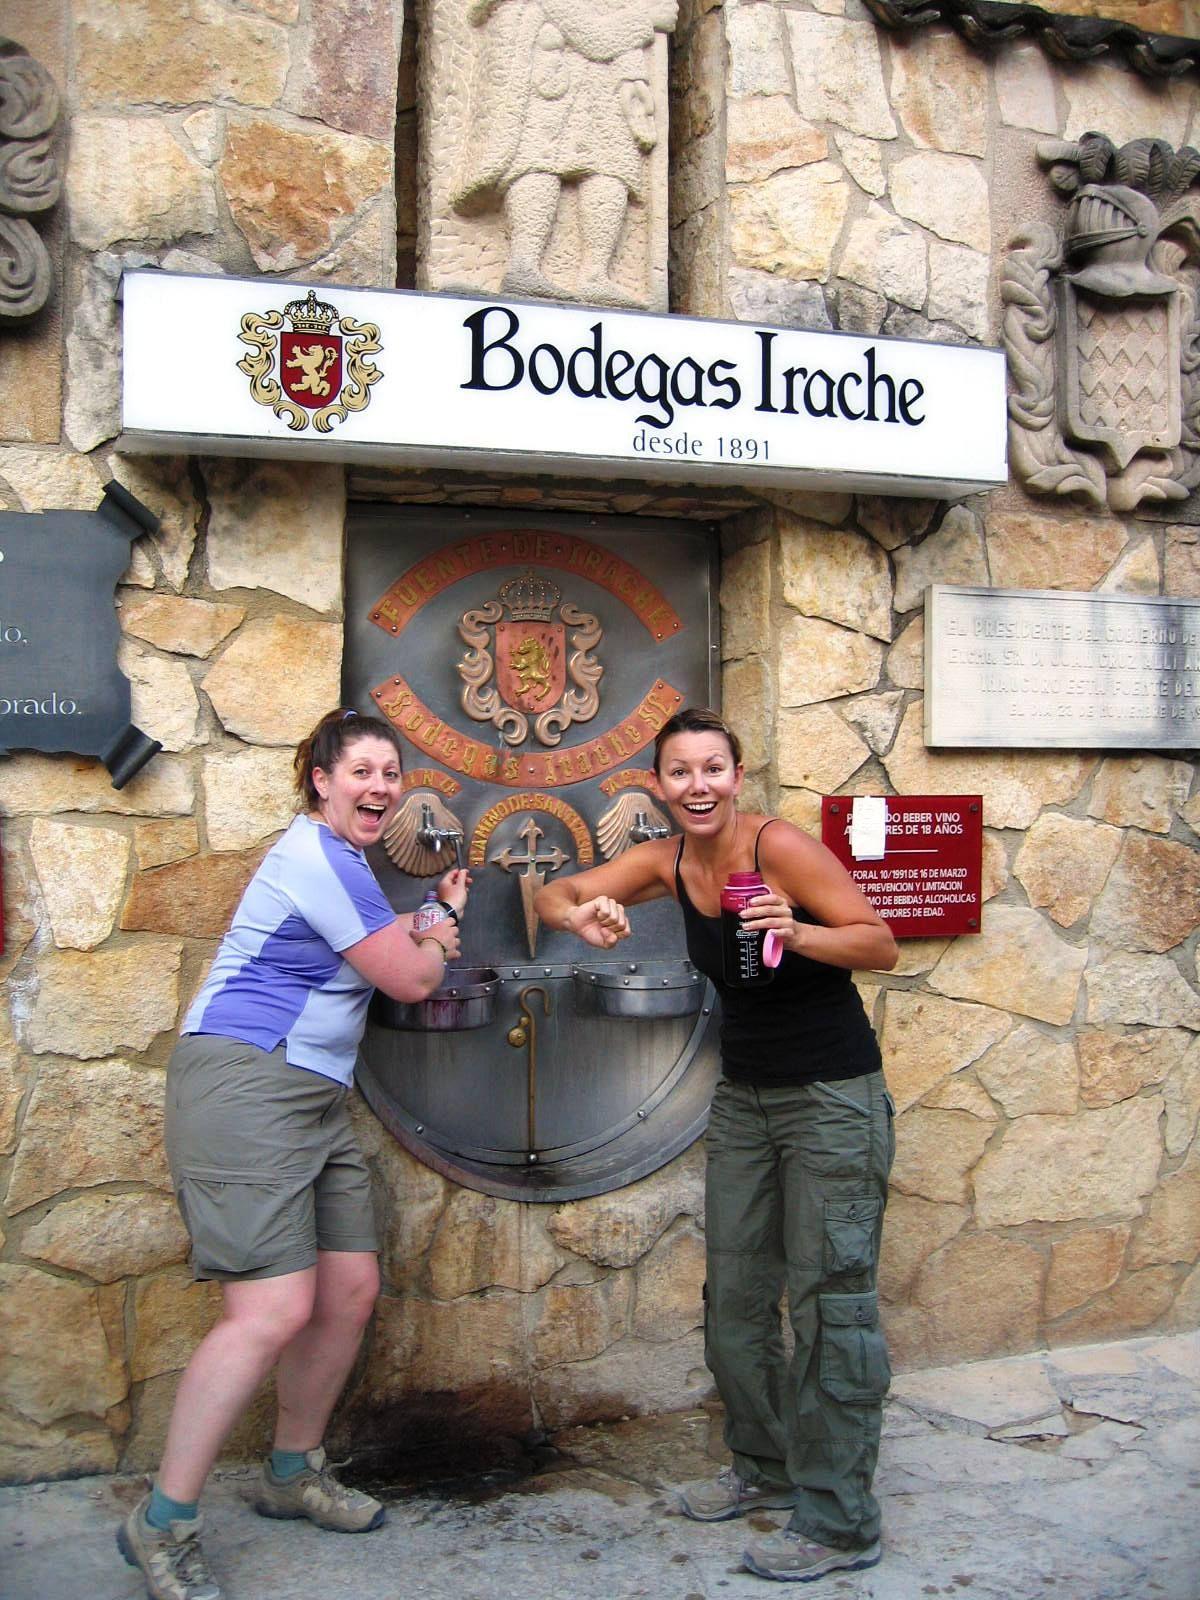 Wine fountain!!! Free wine for pilgrims on El Camino de Santiago de Compostella, Spain. FREE WINE!! www.finisterra.ca